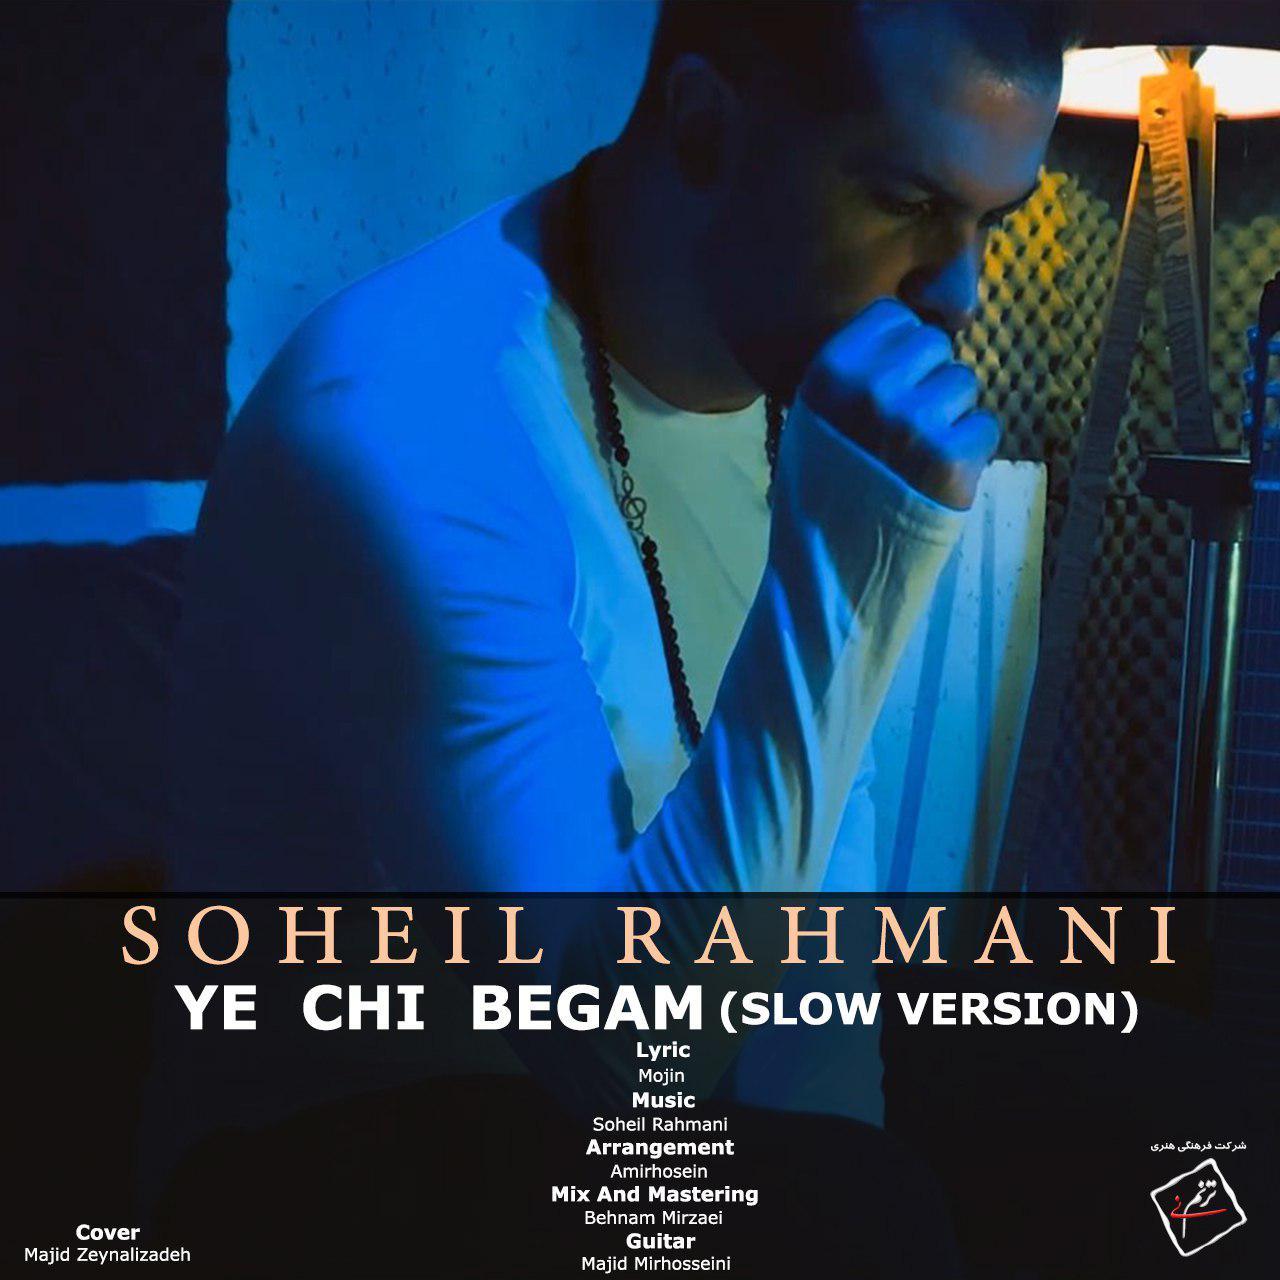 Soheil Rahmani – Ye Chi Begam (Slow Version)